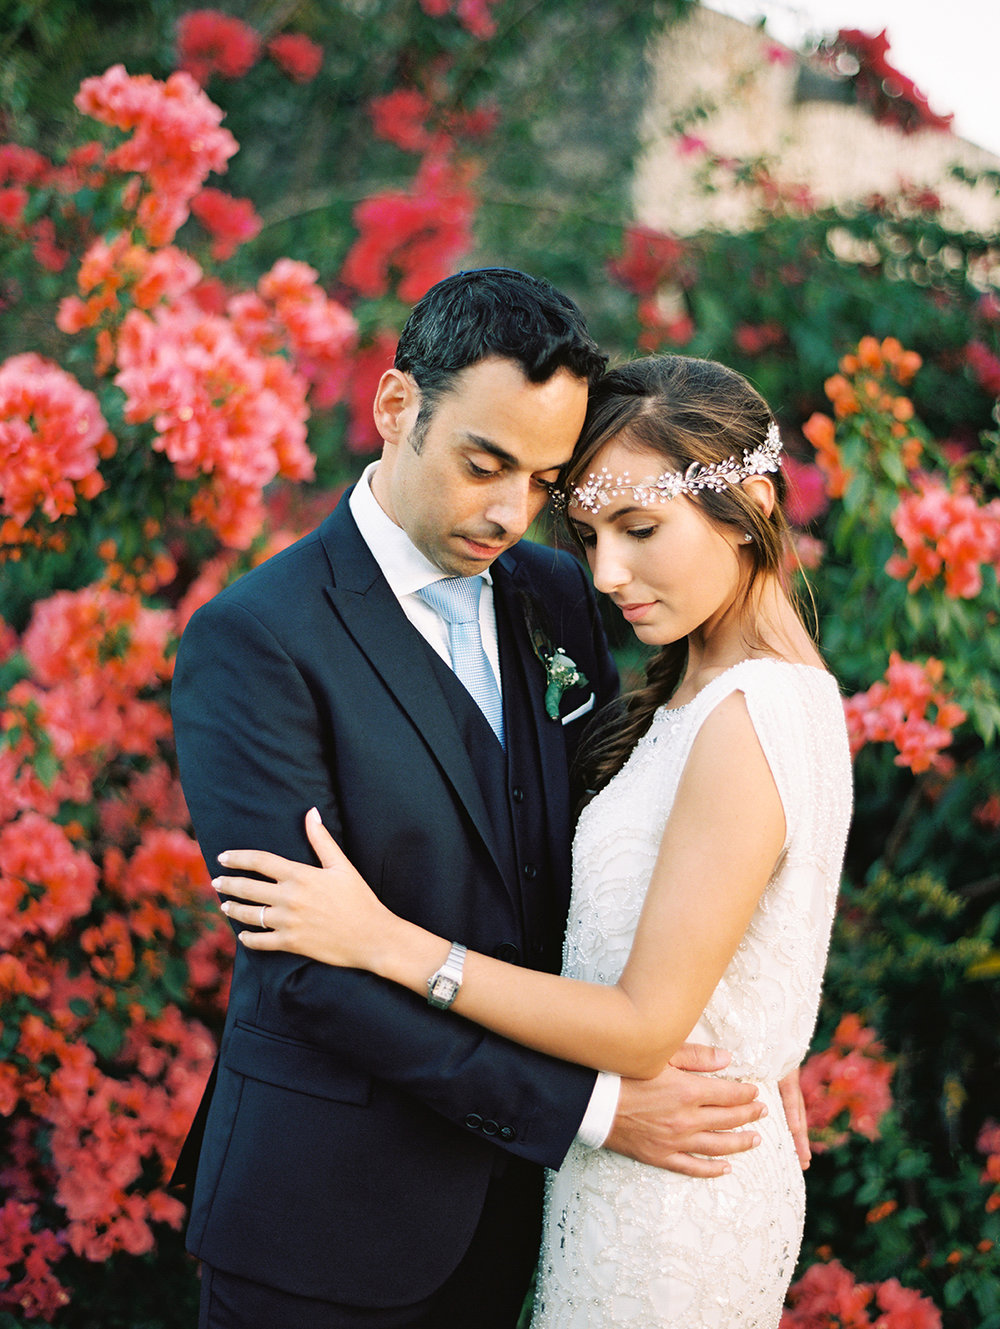 450_Dany+Sarah_Merida_Mexico_Wedding_Brumley & Wells_Fine_art_film_photography.jpg